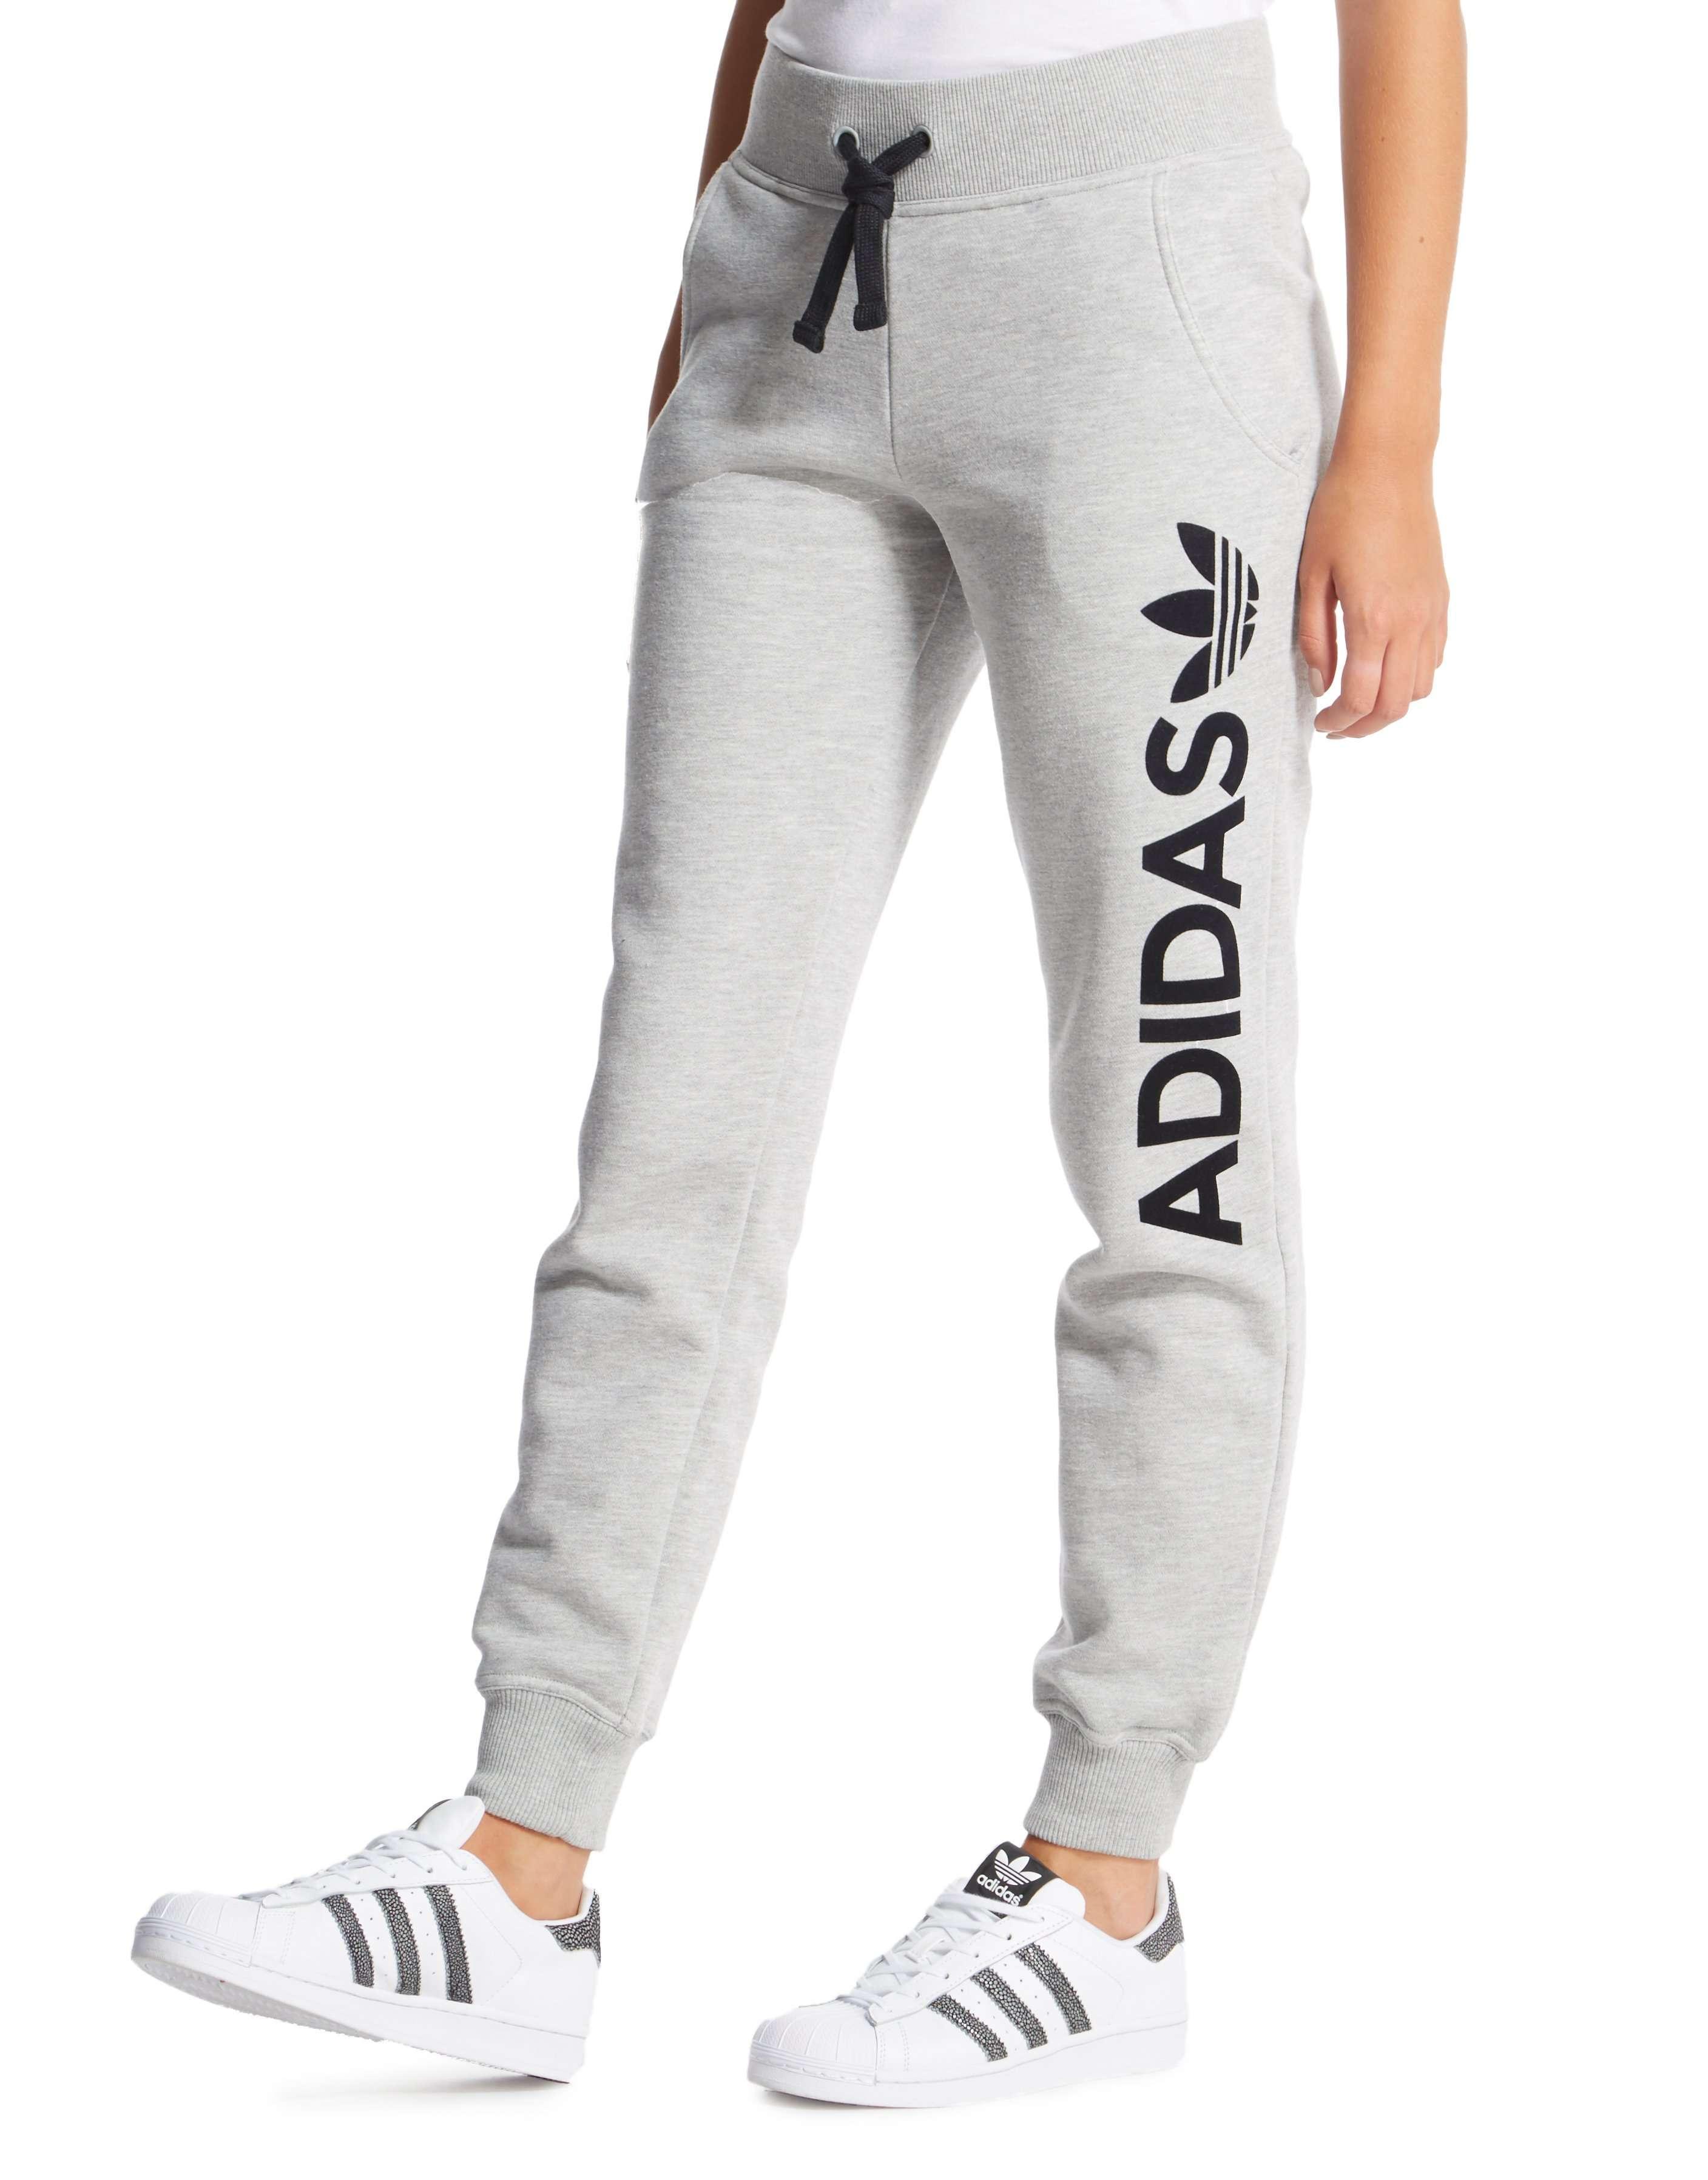 4f2a88b6b91f adidas Originals Linear Logo Fleece Pants